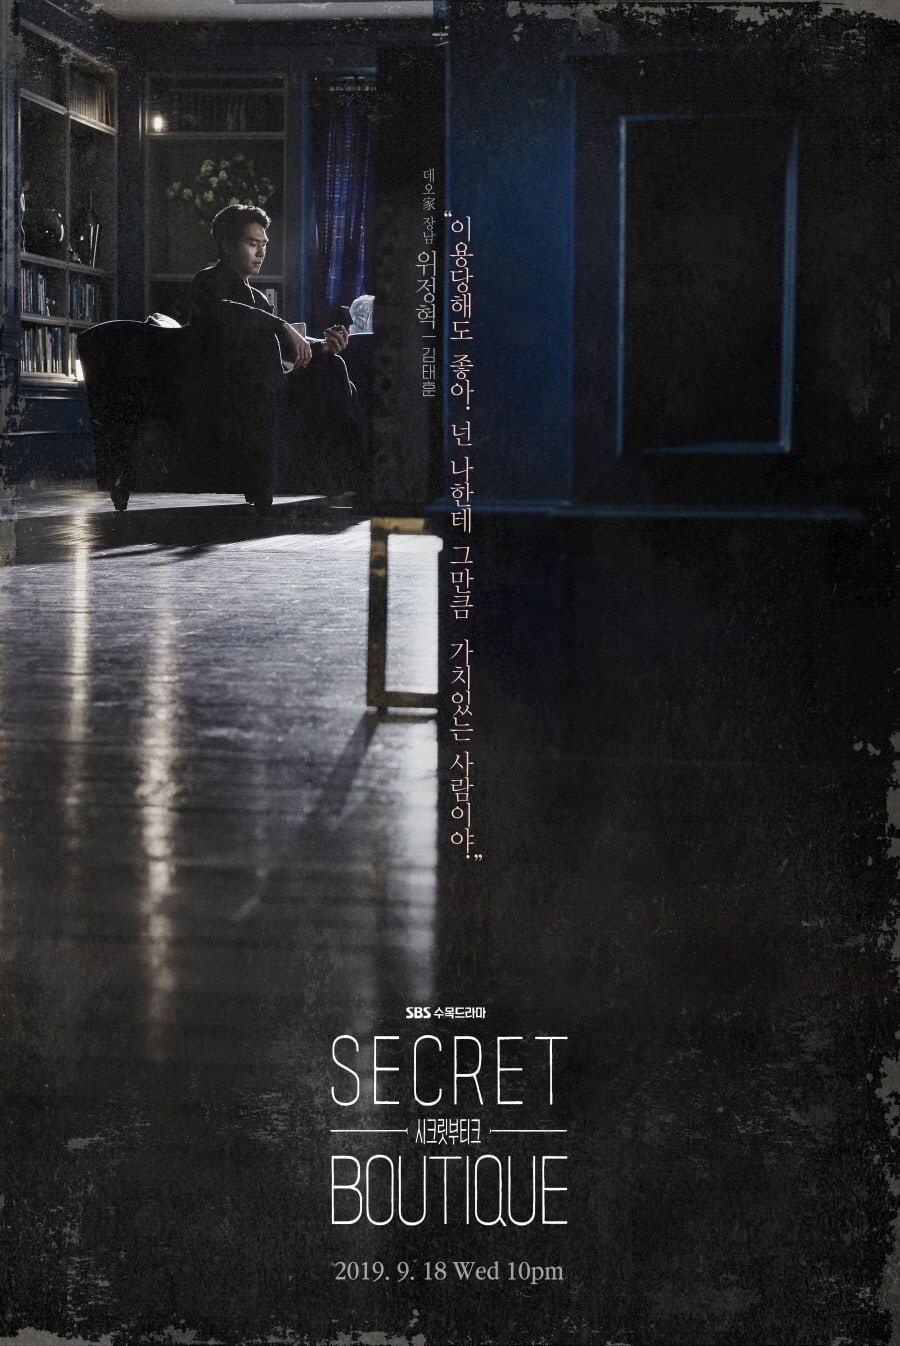 kim-tae-hoon-secret-boutique.jpg